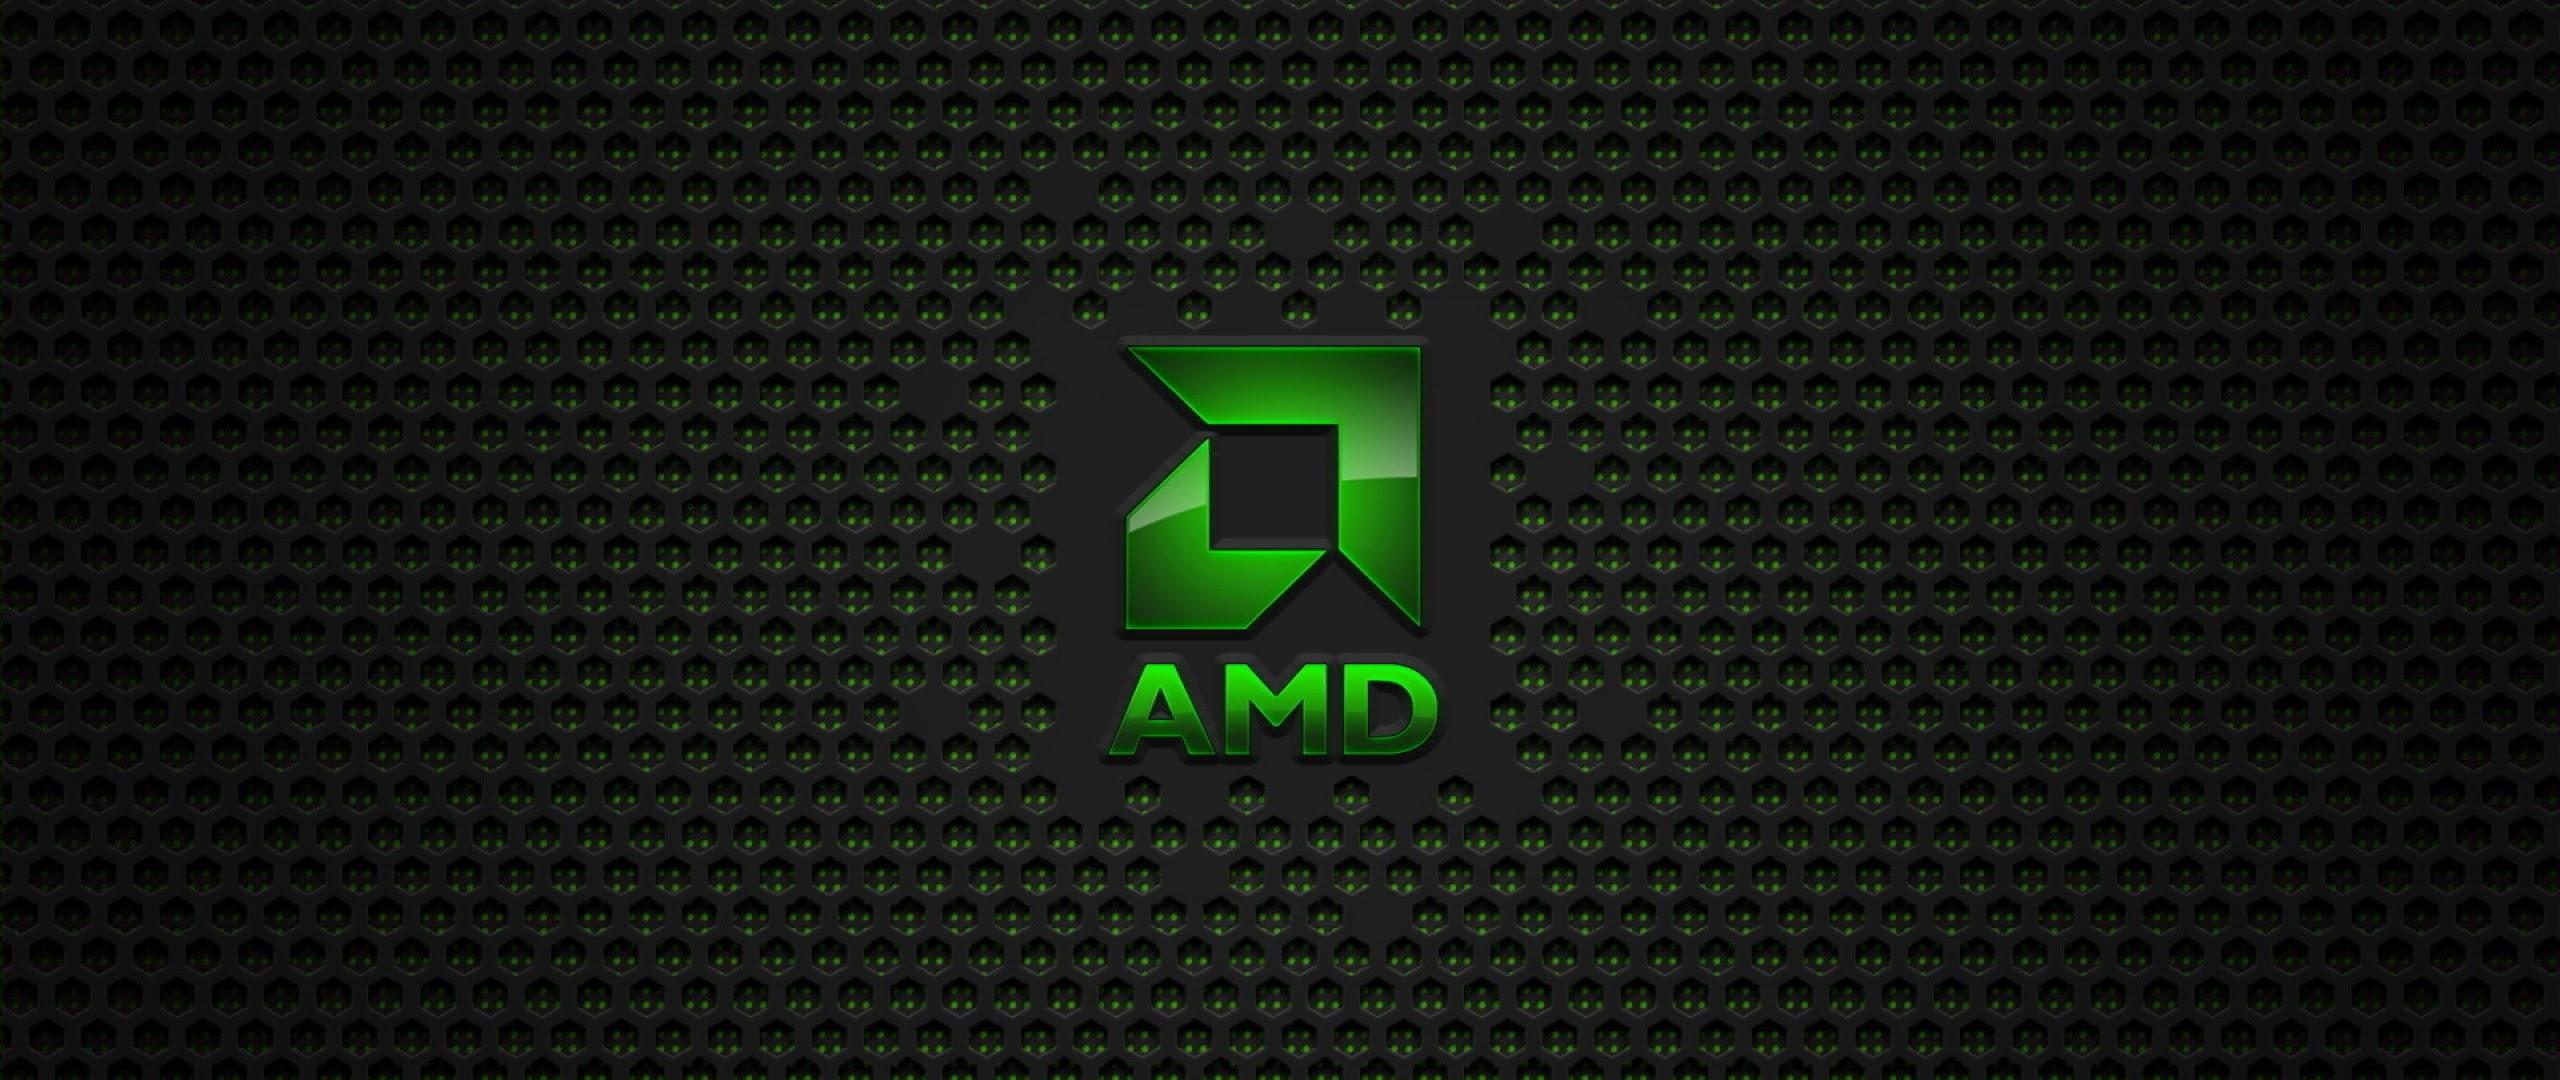 AMD Radeon Wallpapers (79+ images)